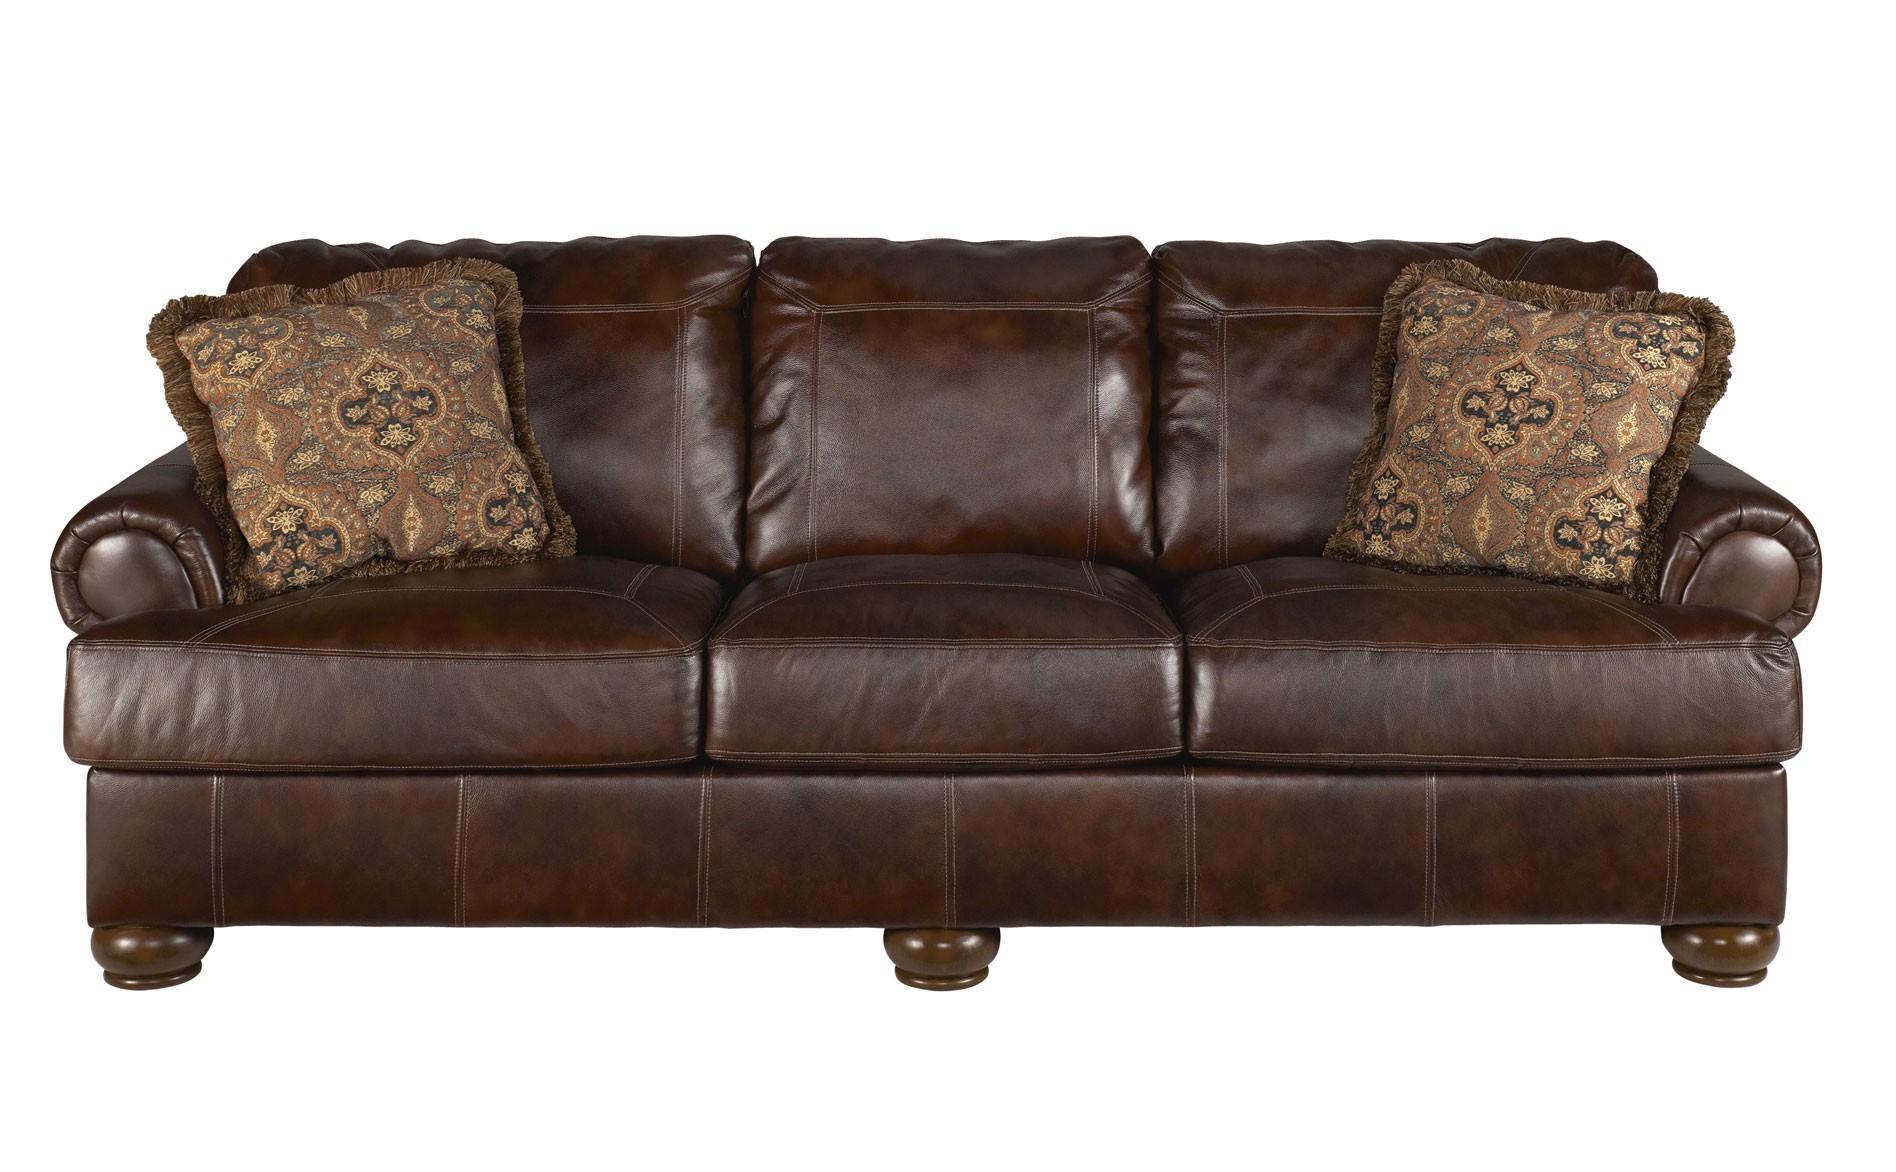 leather sofa upholstery VUVEAJD